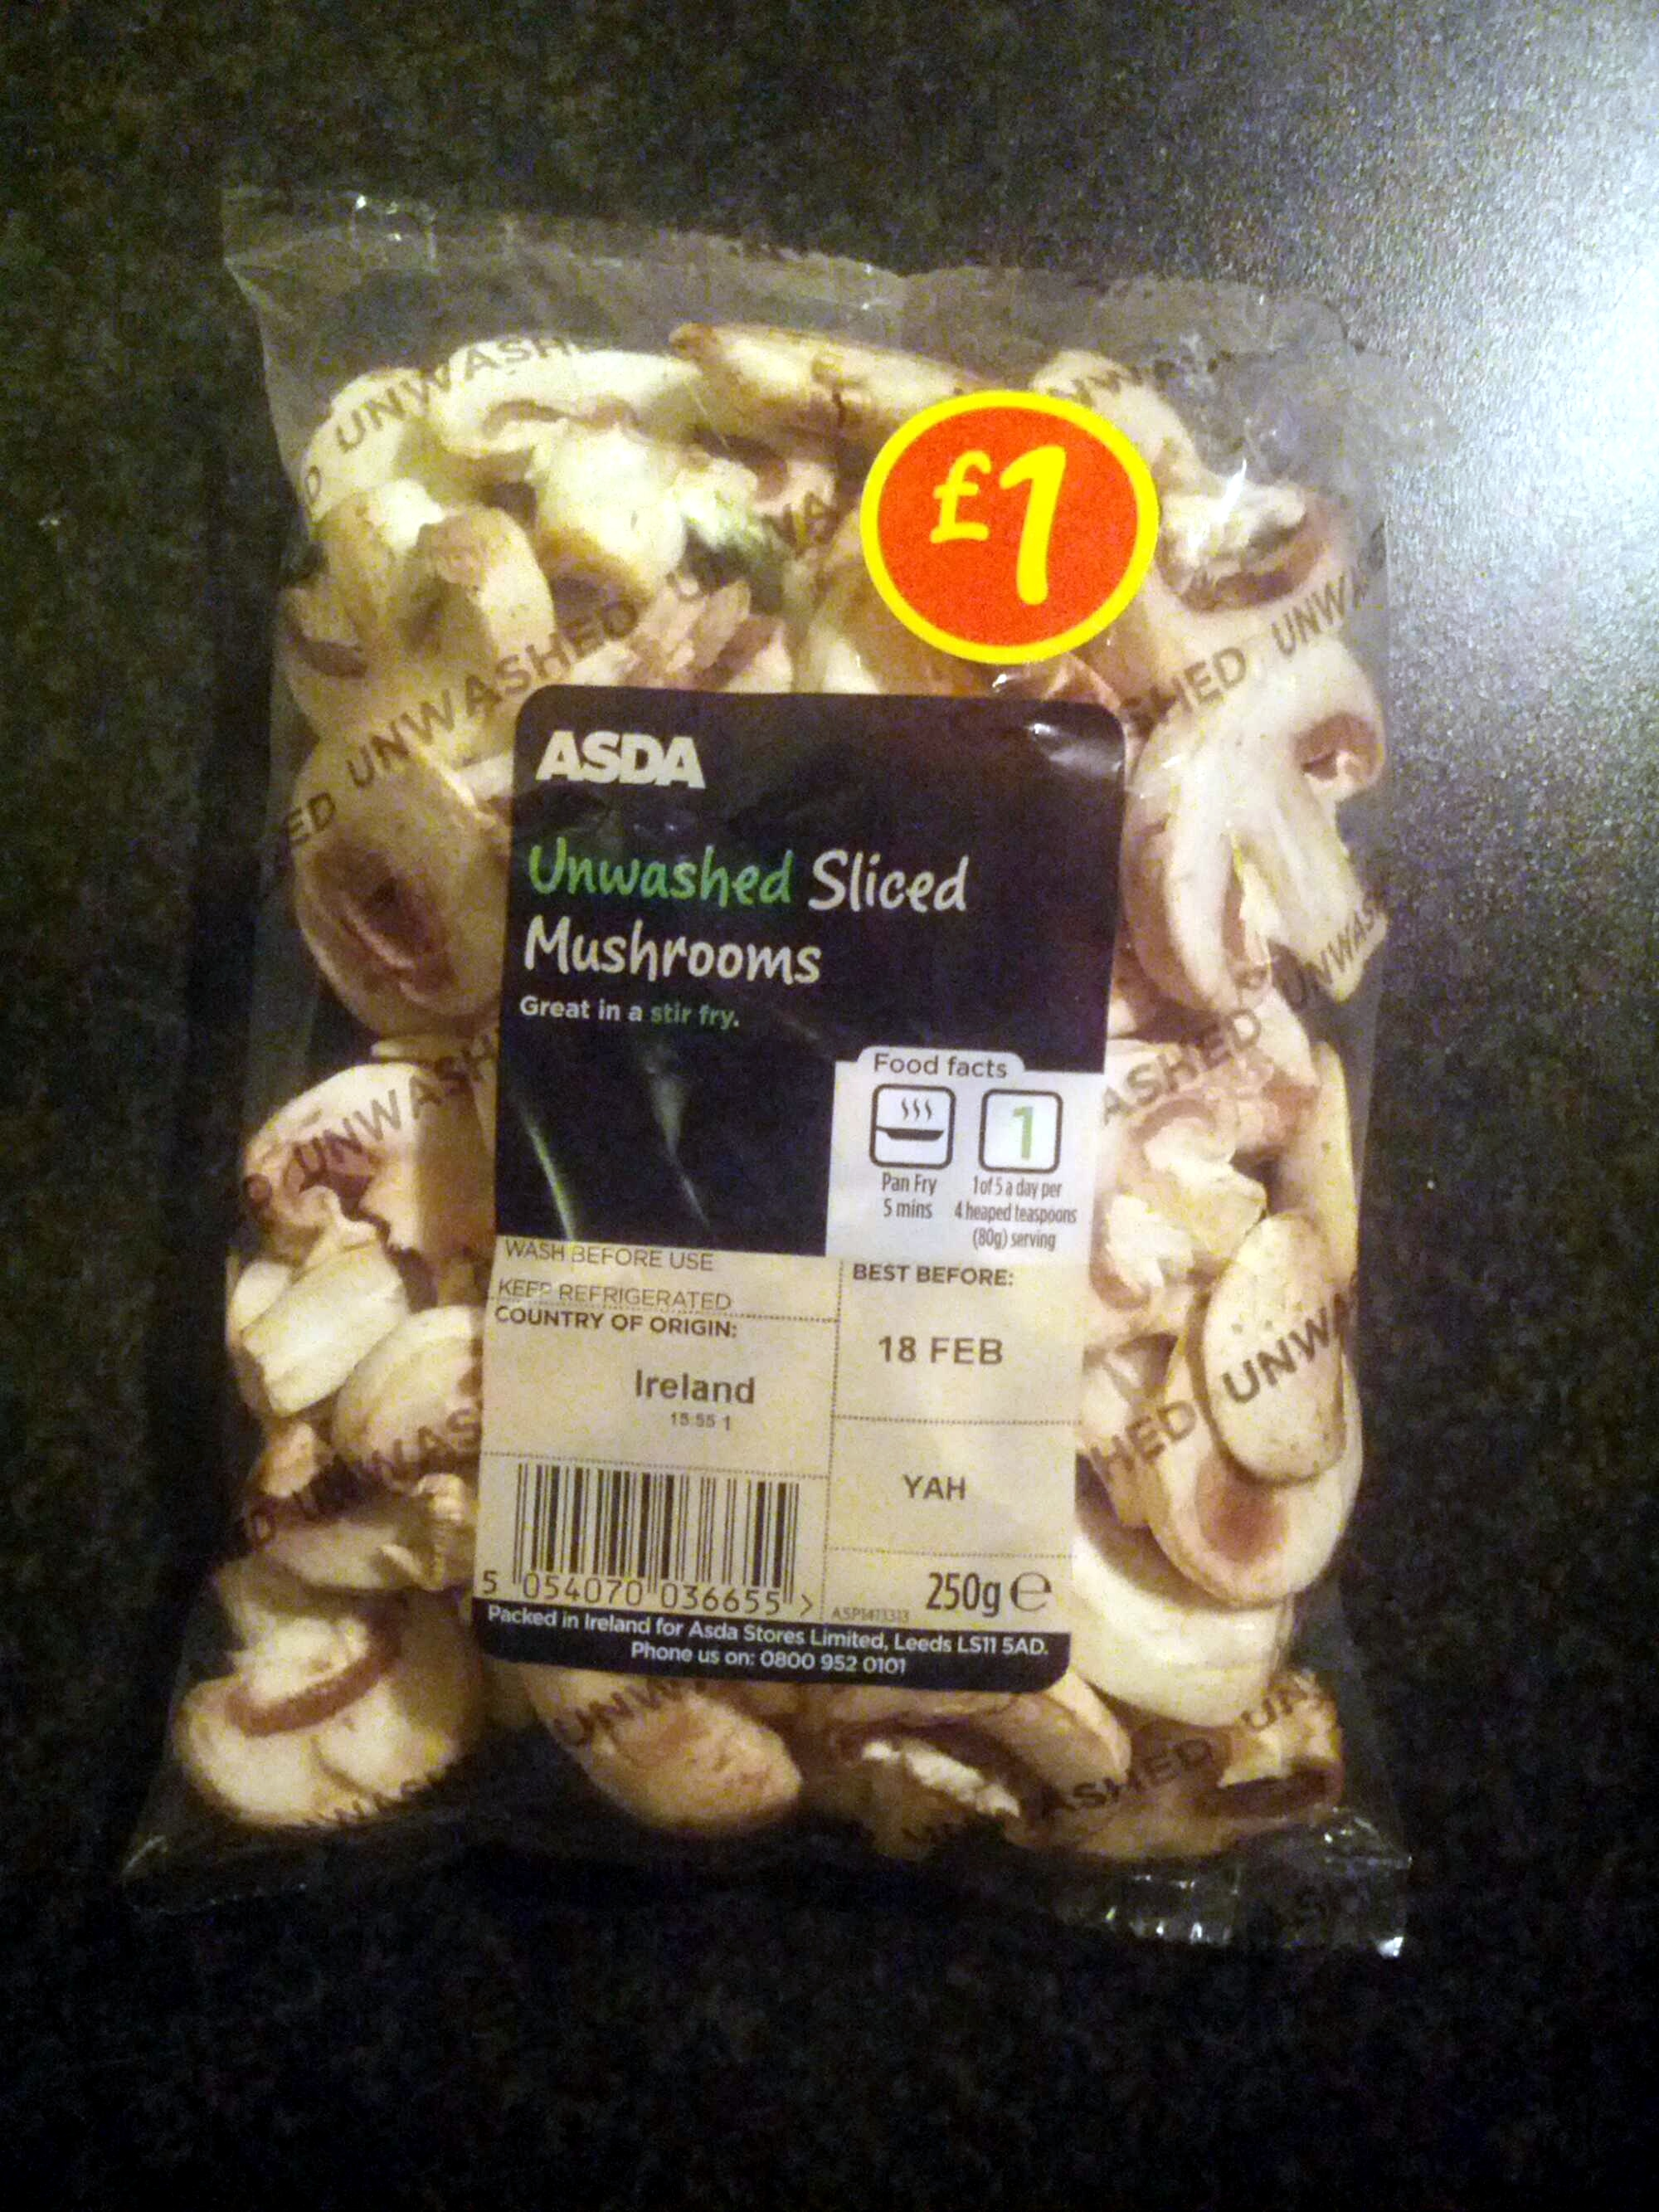 unwashed sliced mushrooms - Product